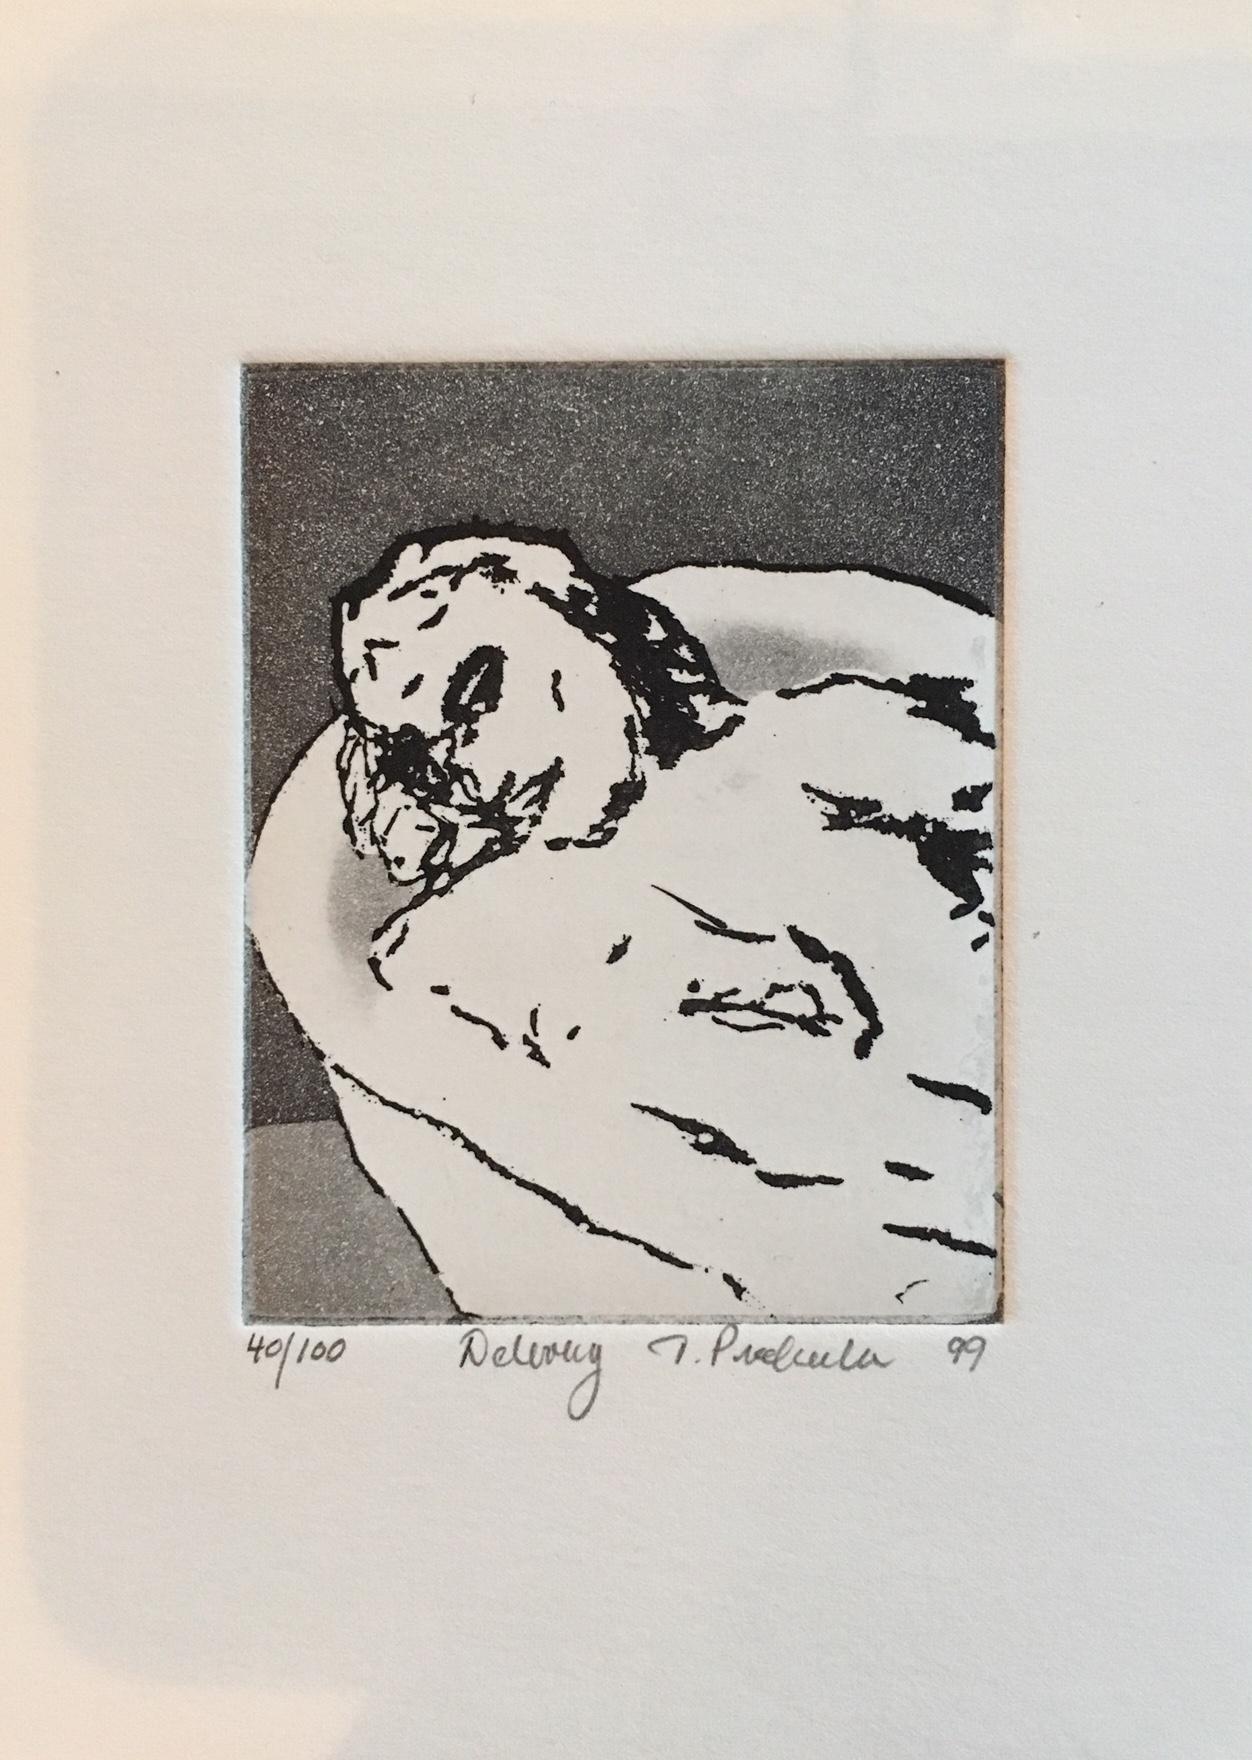 Tom Prochaska, Delivery, lift ground etching